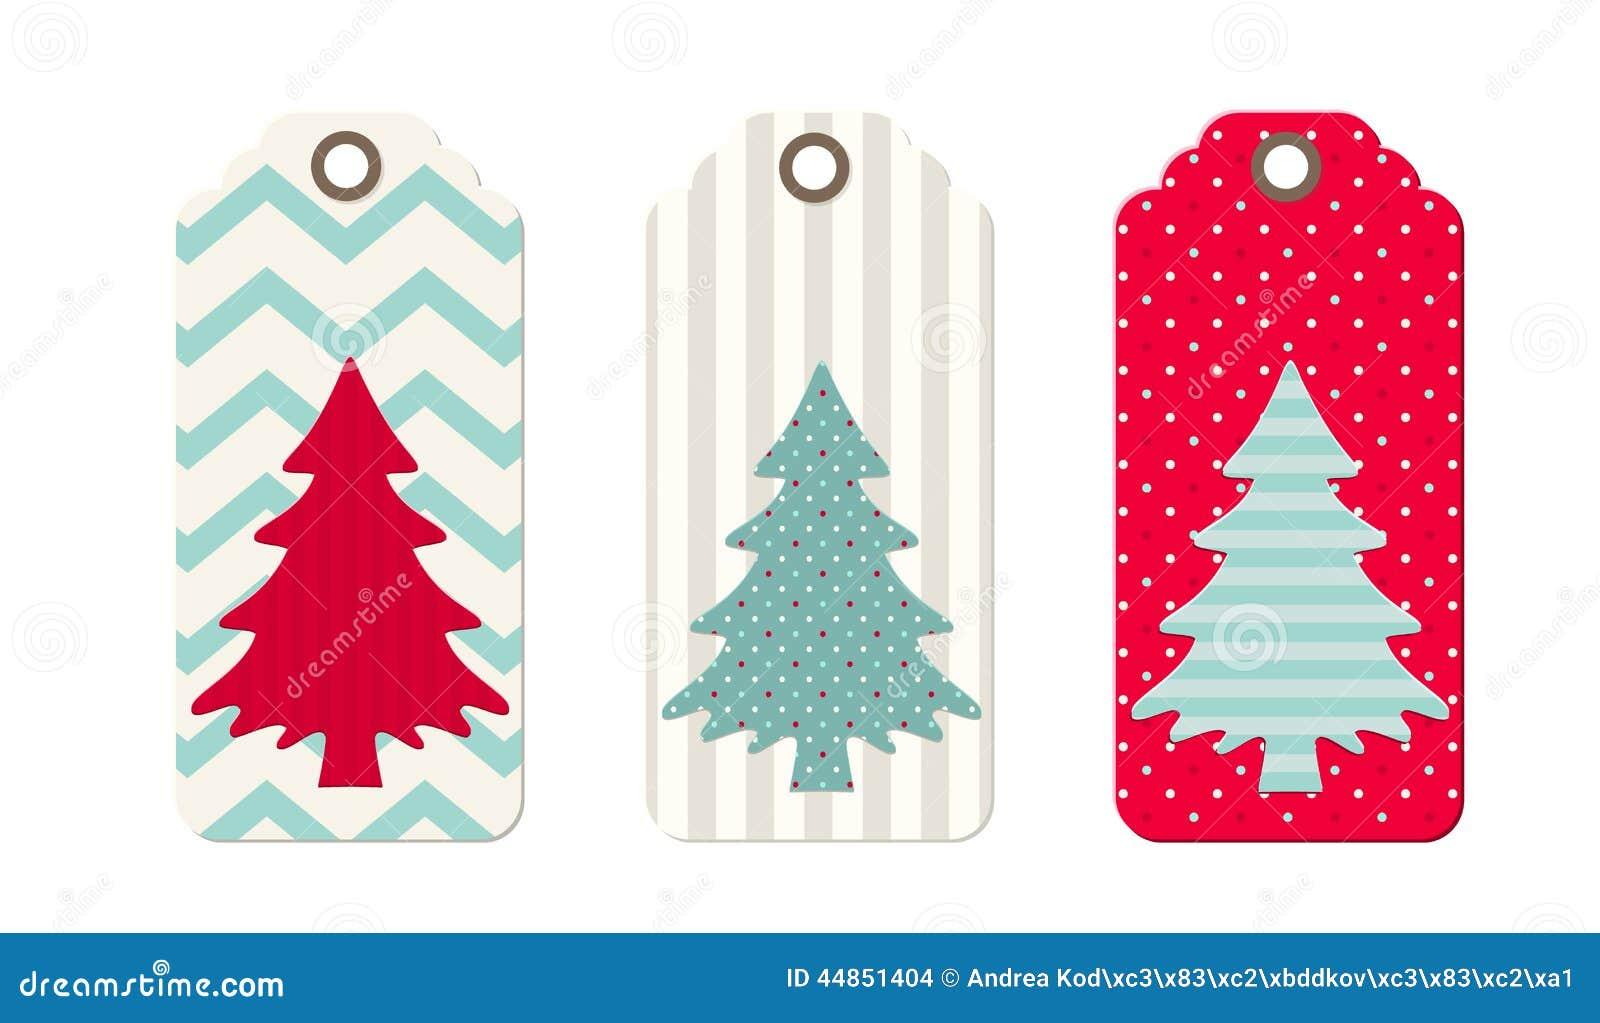 Origami Christmas Tree Gift Tag